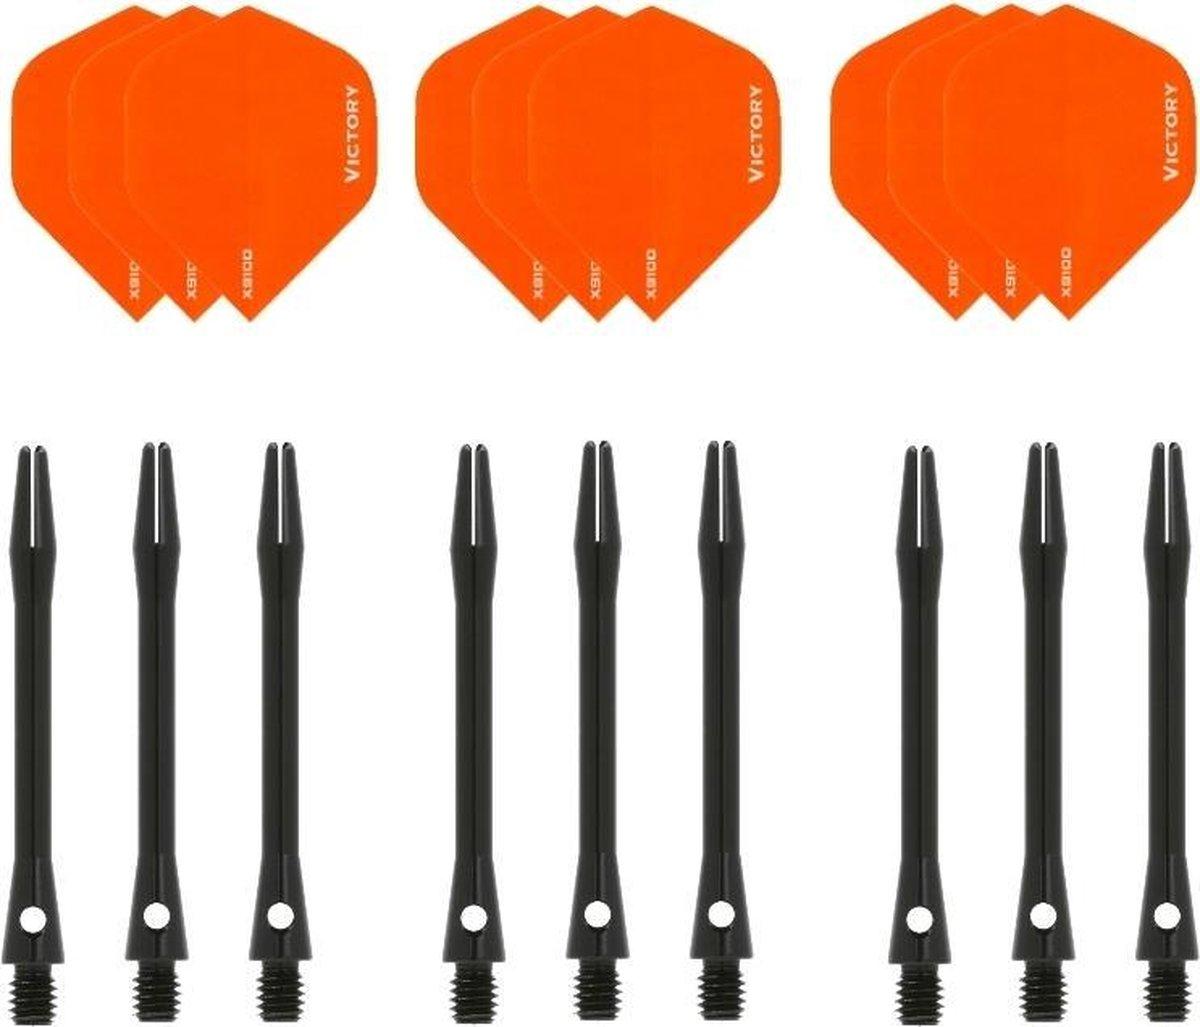 Dragon darts - 3 sets - XS100 Poly - Oranje - Darts flights - plus 3 sets - aluminium - darts shafts - zwart - medium